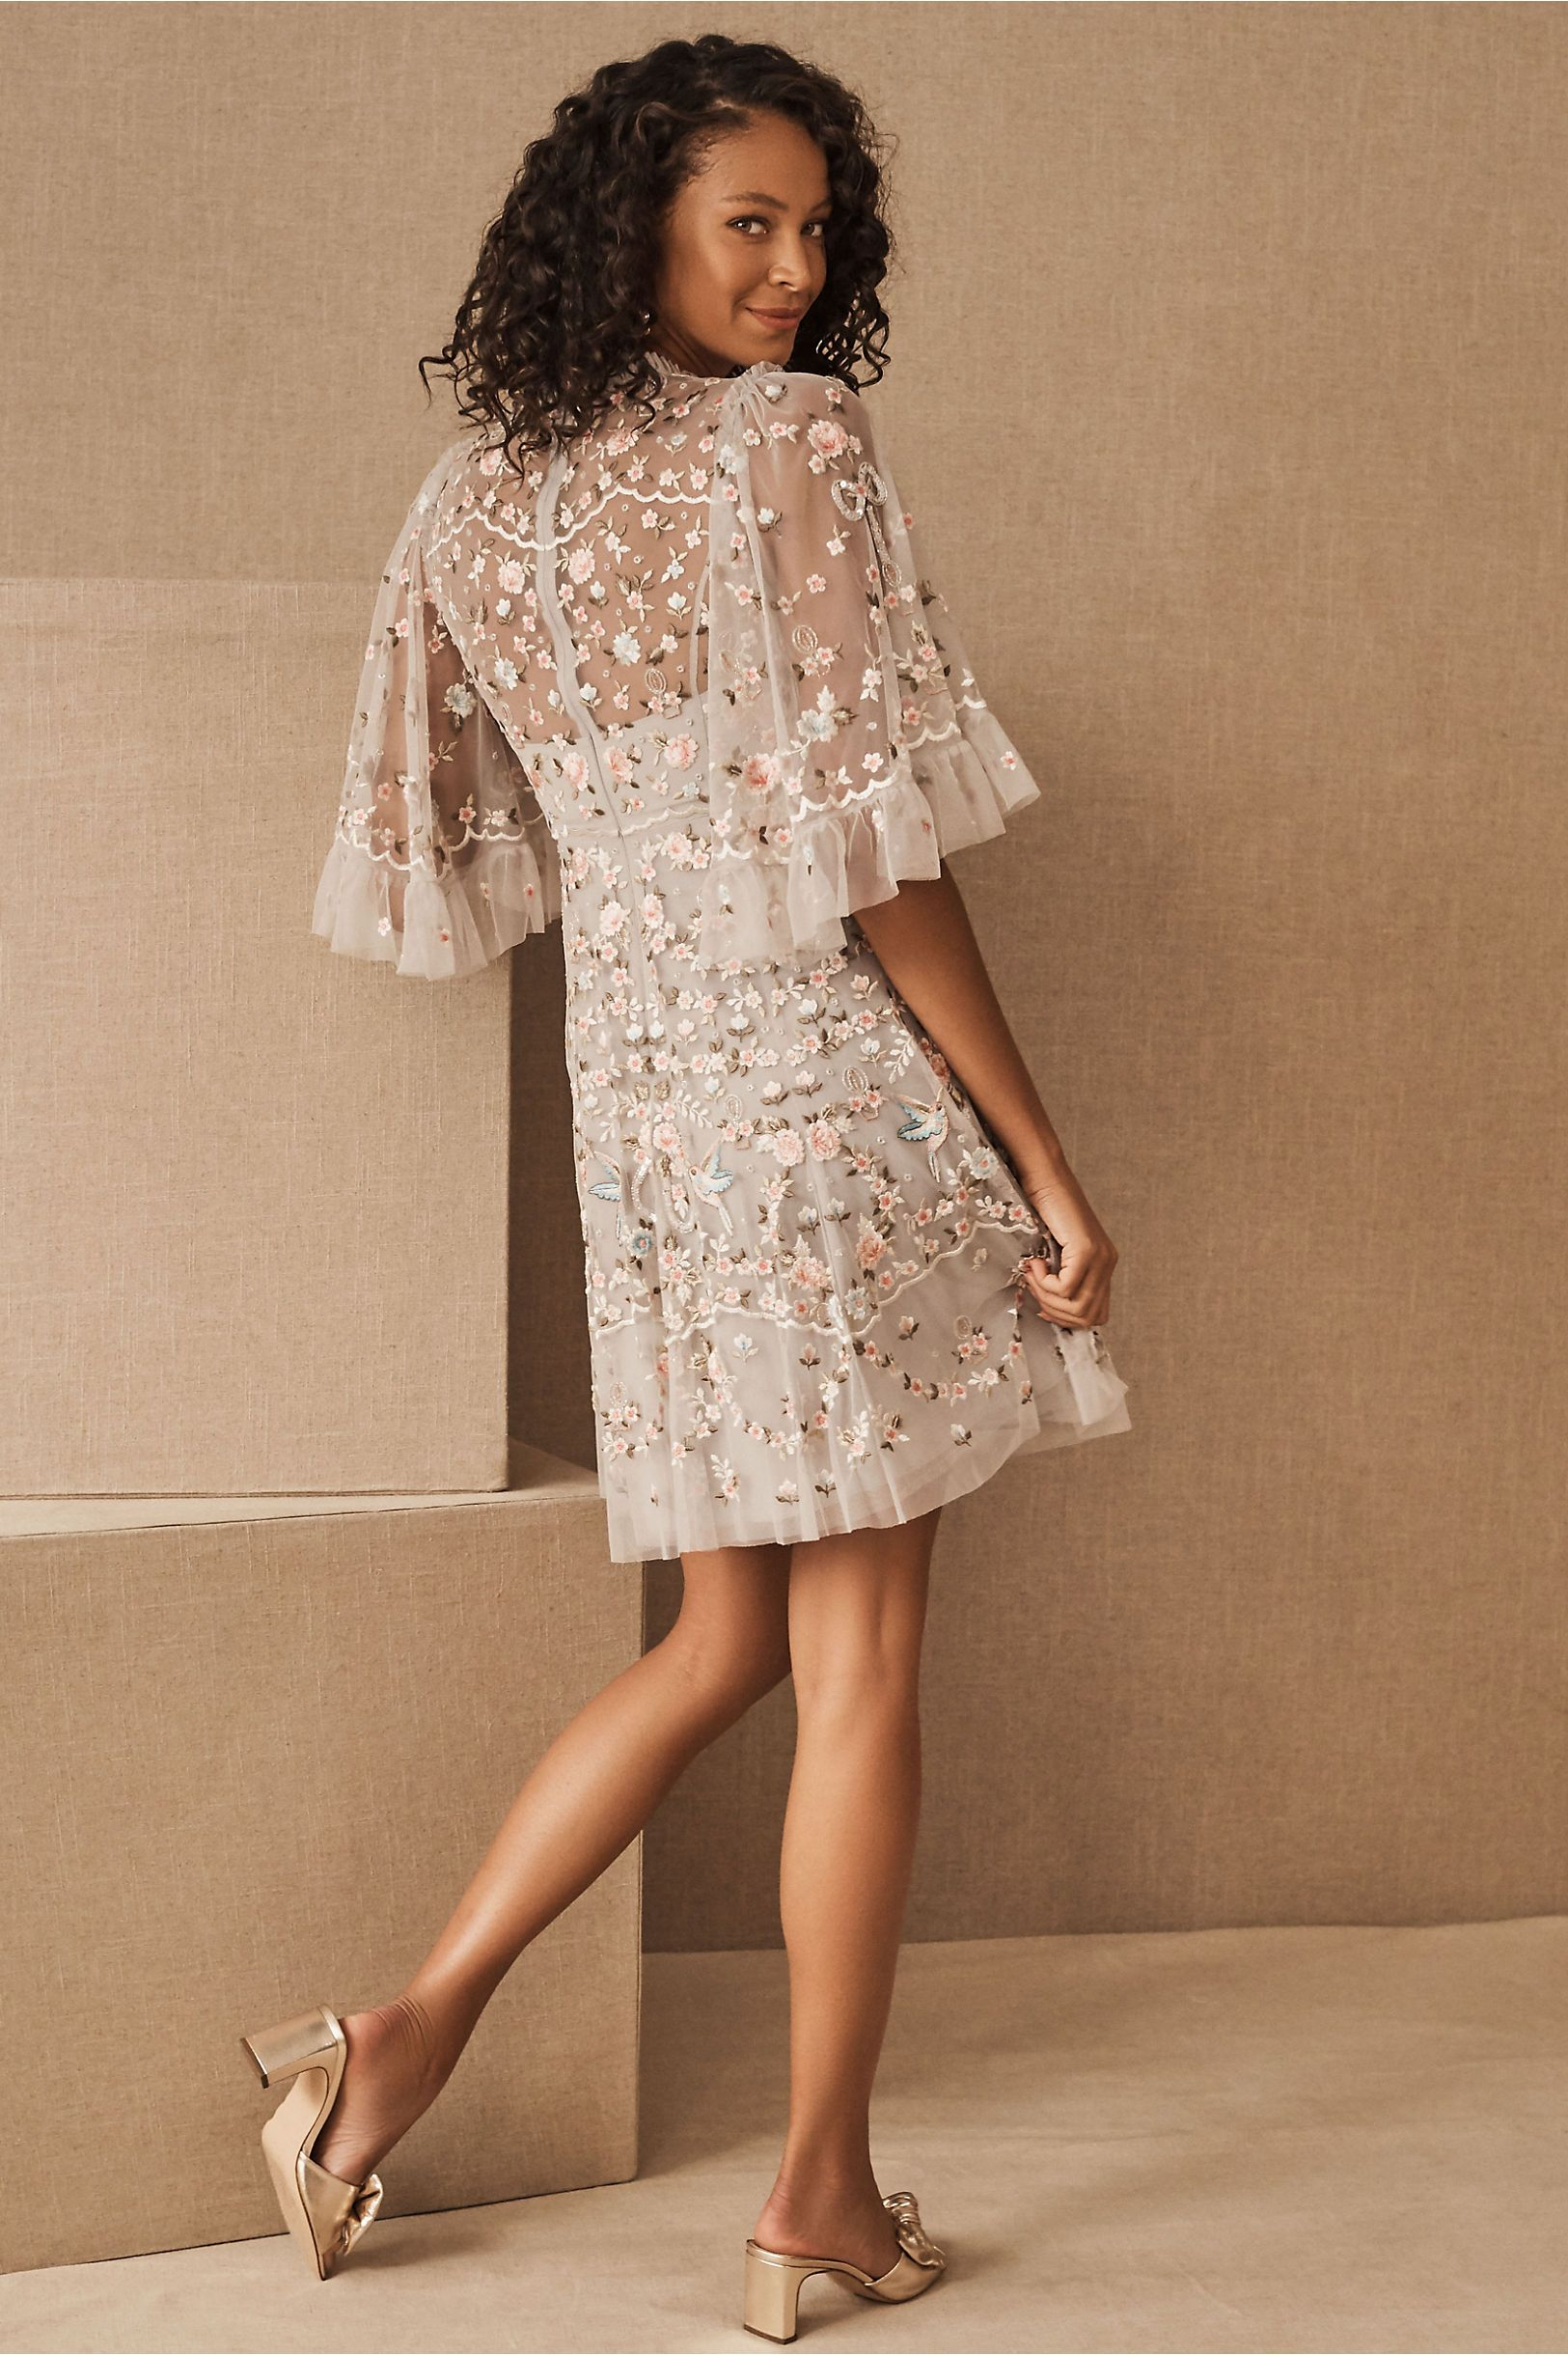 Needle Thread Regency Garden Mini Dress Engagement Party Dresses Mini Dress Dresses [ 2440 x 1625 Pixel ]